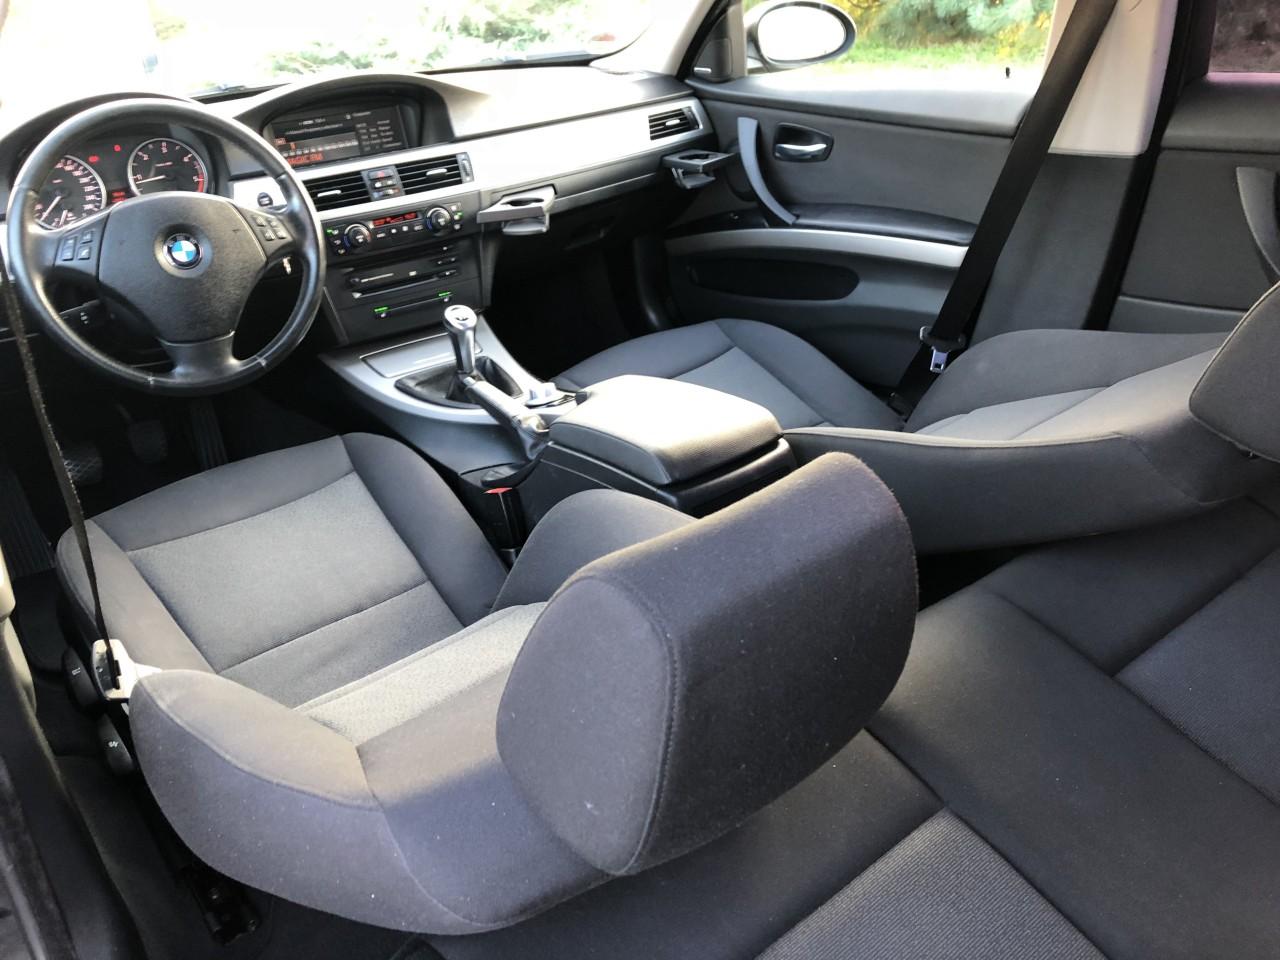 BMW 320 BMW 320d 163Cp  Navi MARE / Webasto / Xenon / Sistem audio ALPINE din fabrica / Pilot automat / suspensie noua Bilsten / IMPECABILA, MASINA TINUTA IN GARAJ / RECENT ADUSA DIN GERMANIA!!! 2006